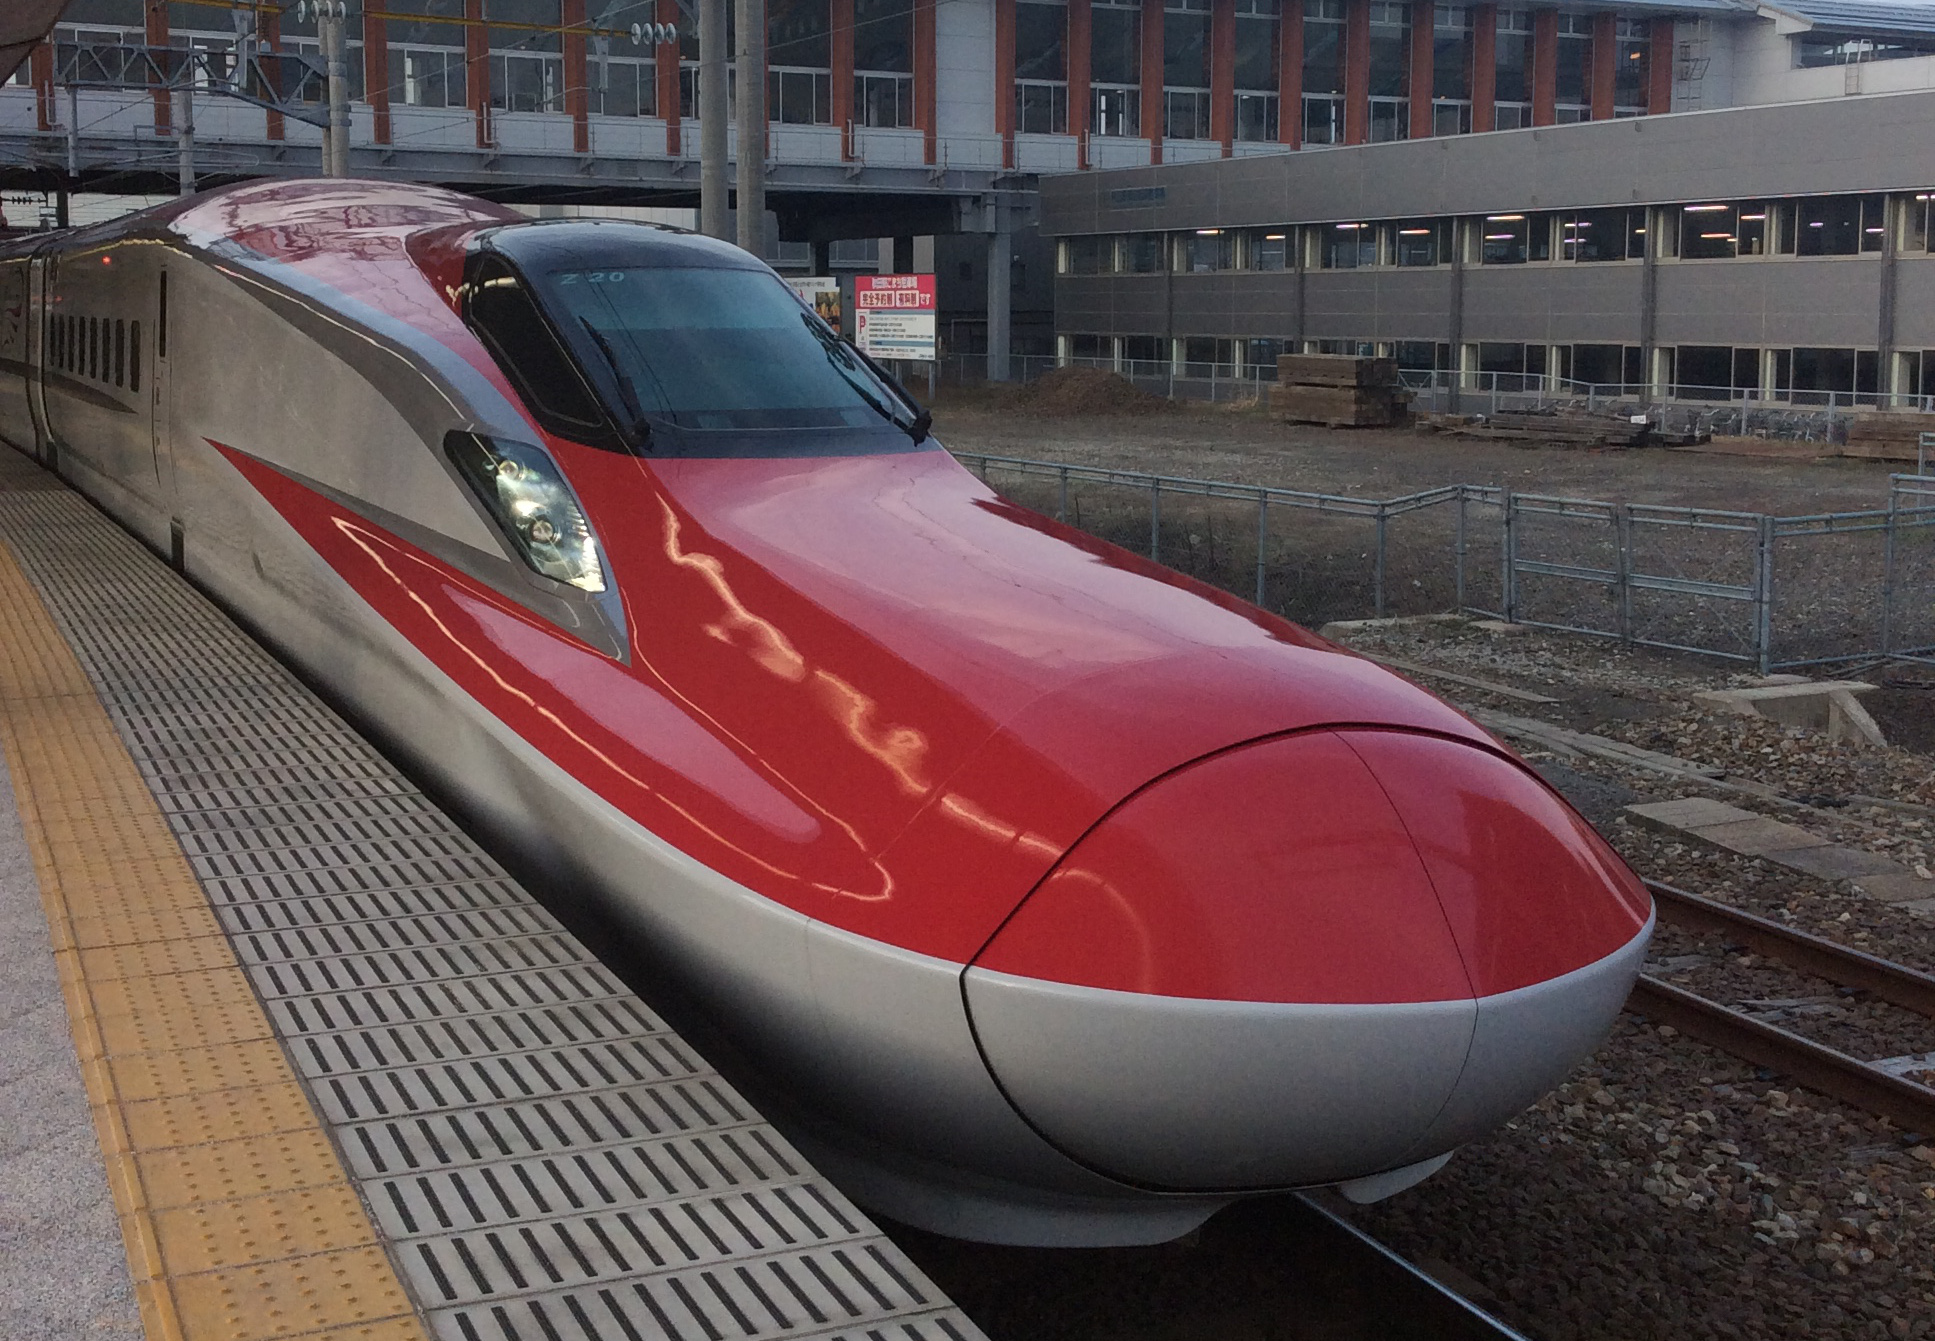 akita komachi shinkansen at akita station